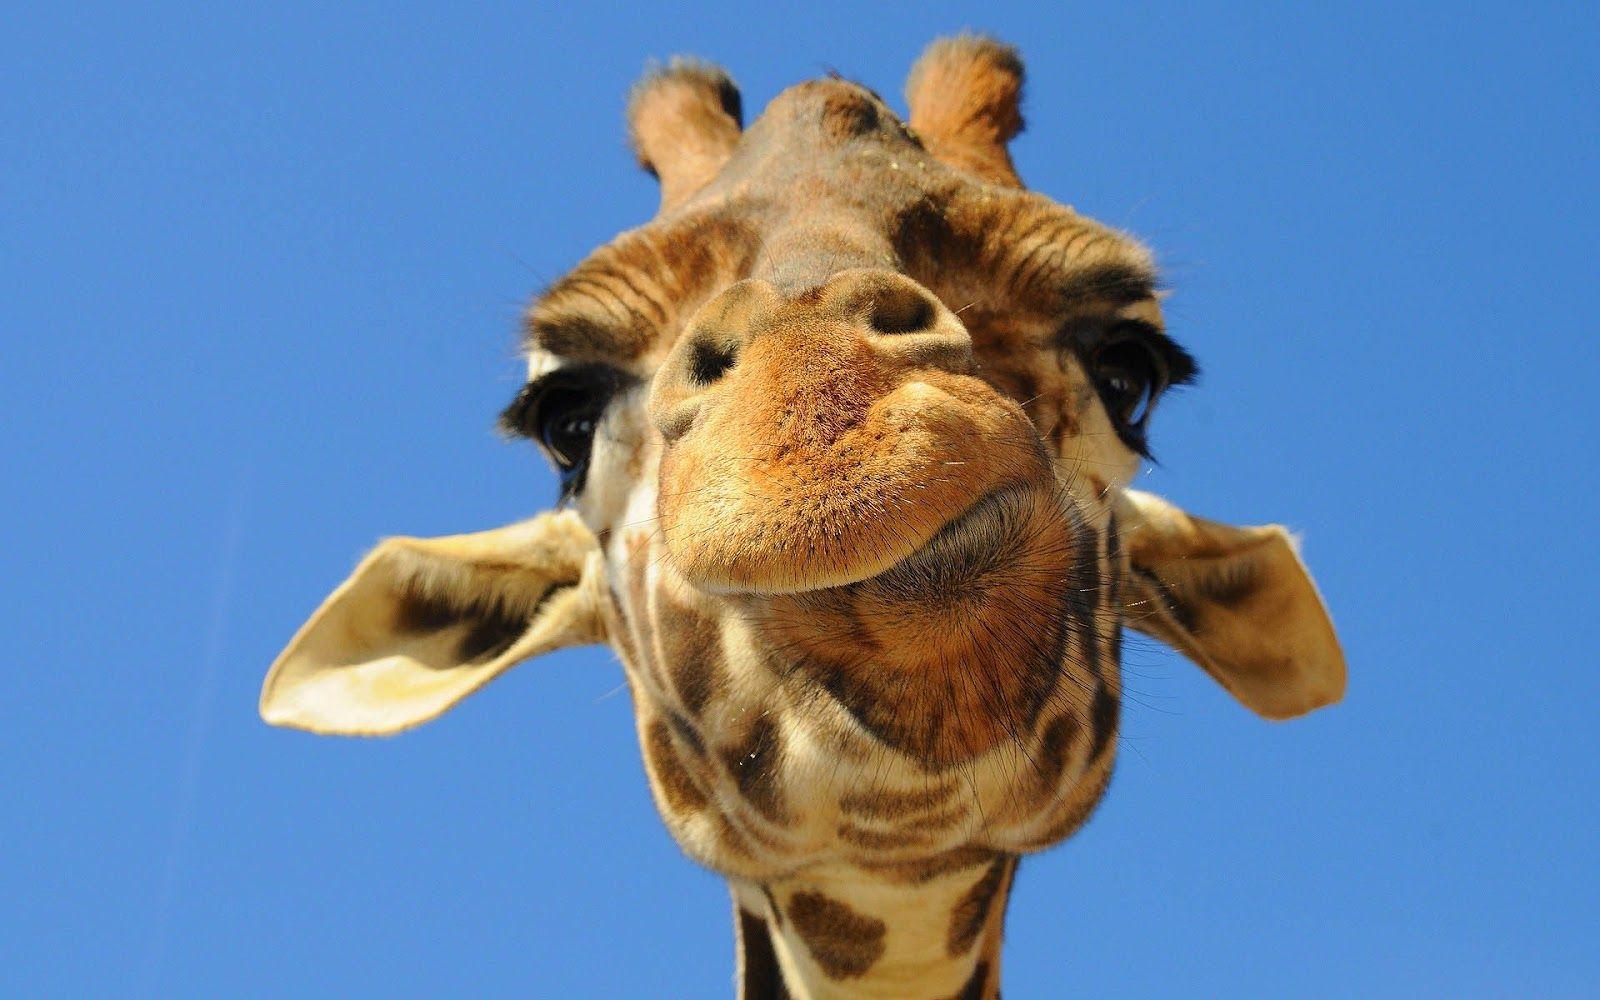 funny giraffe pictures portrait picture of a giraffe HD 1600x1000